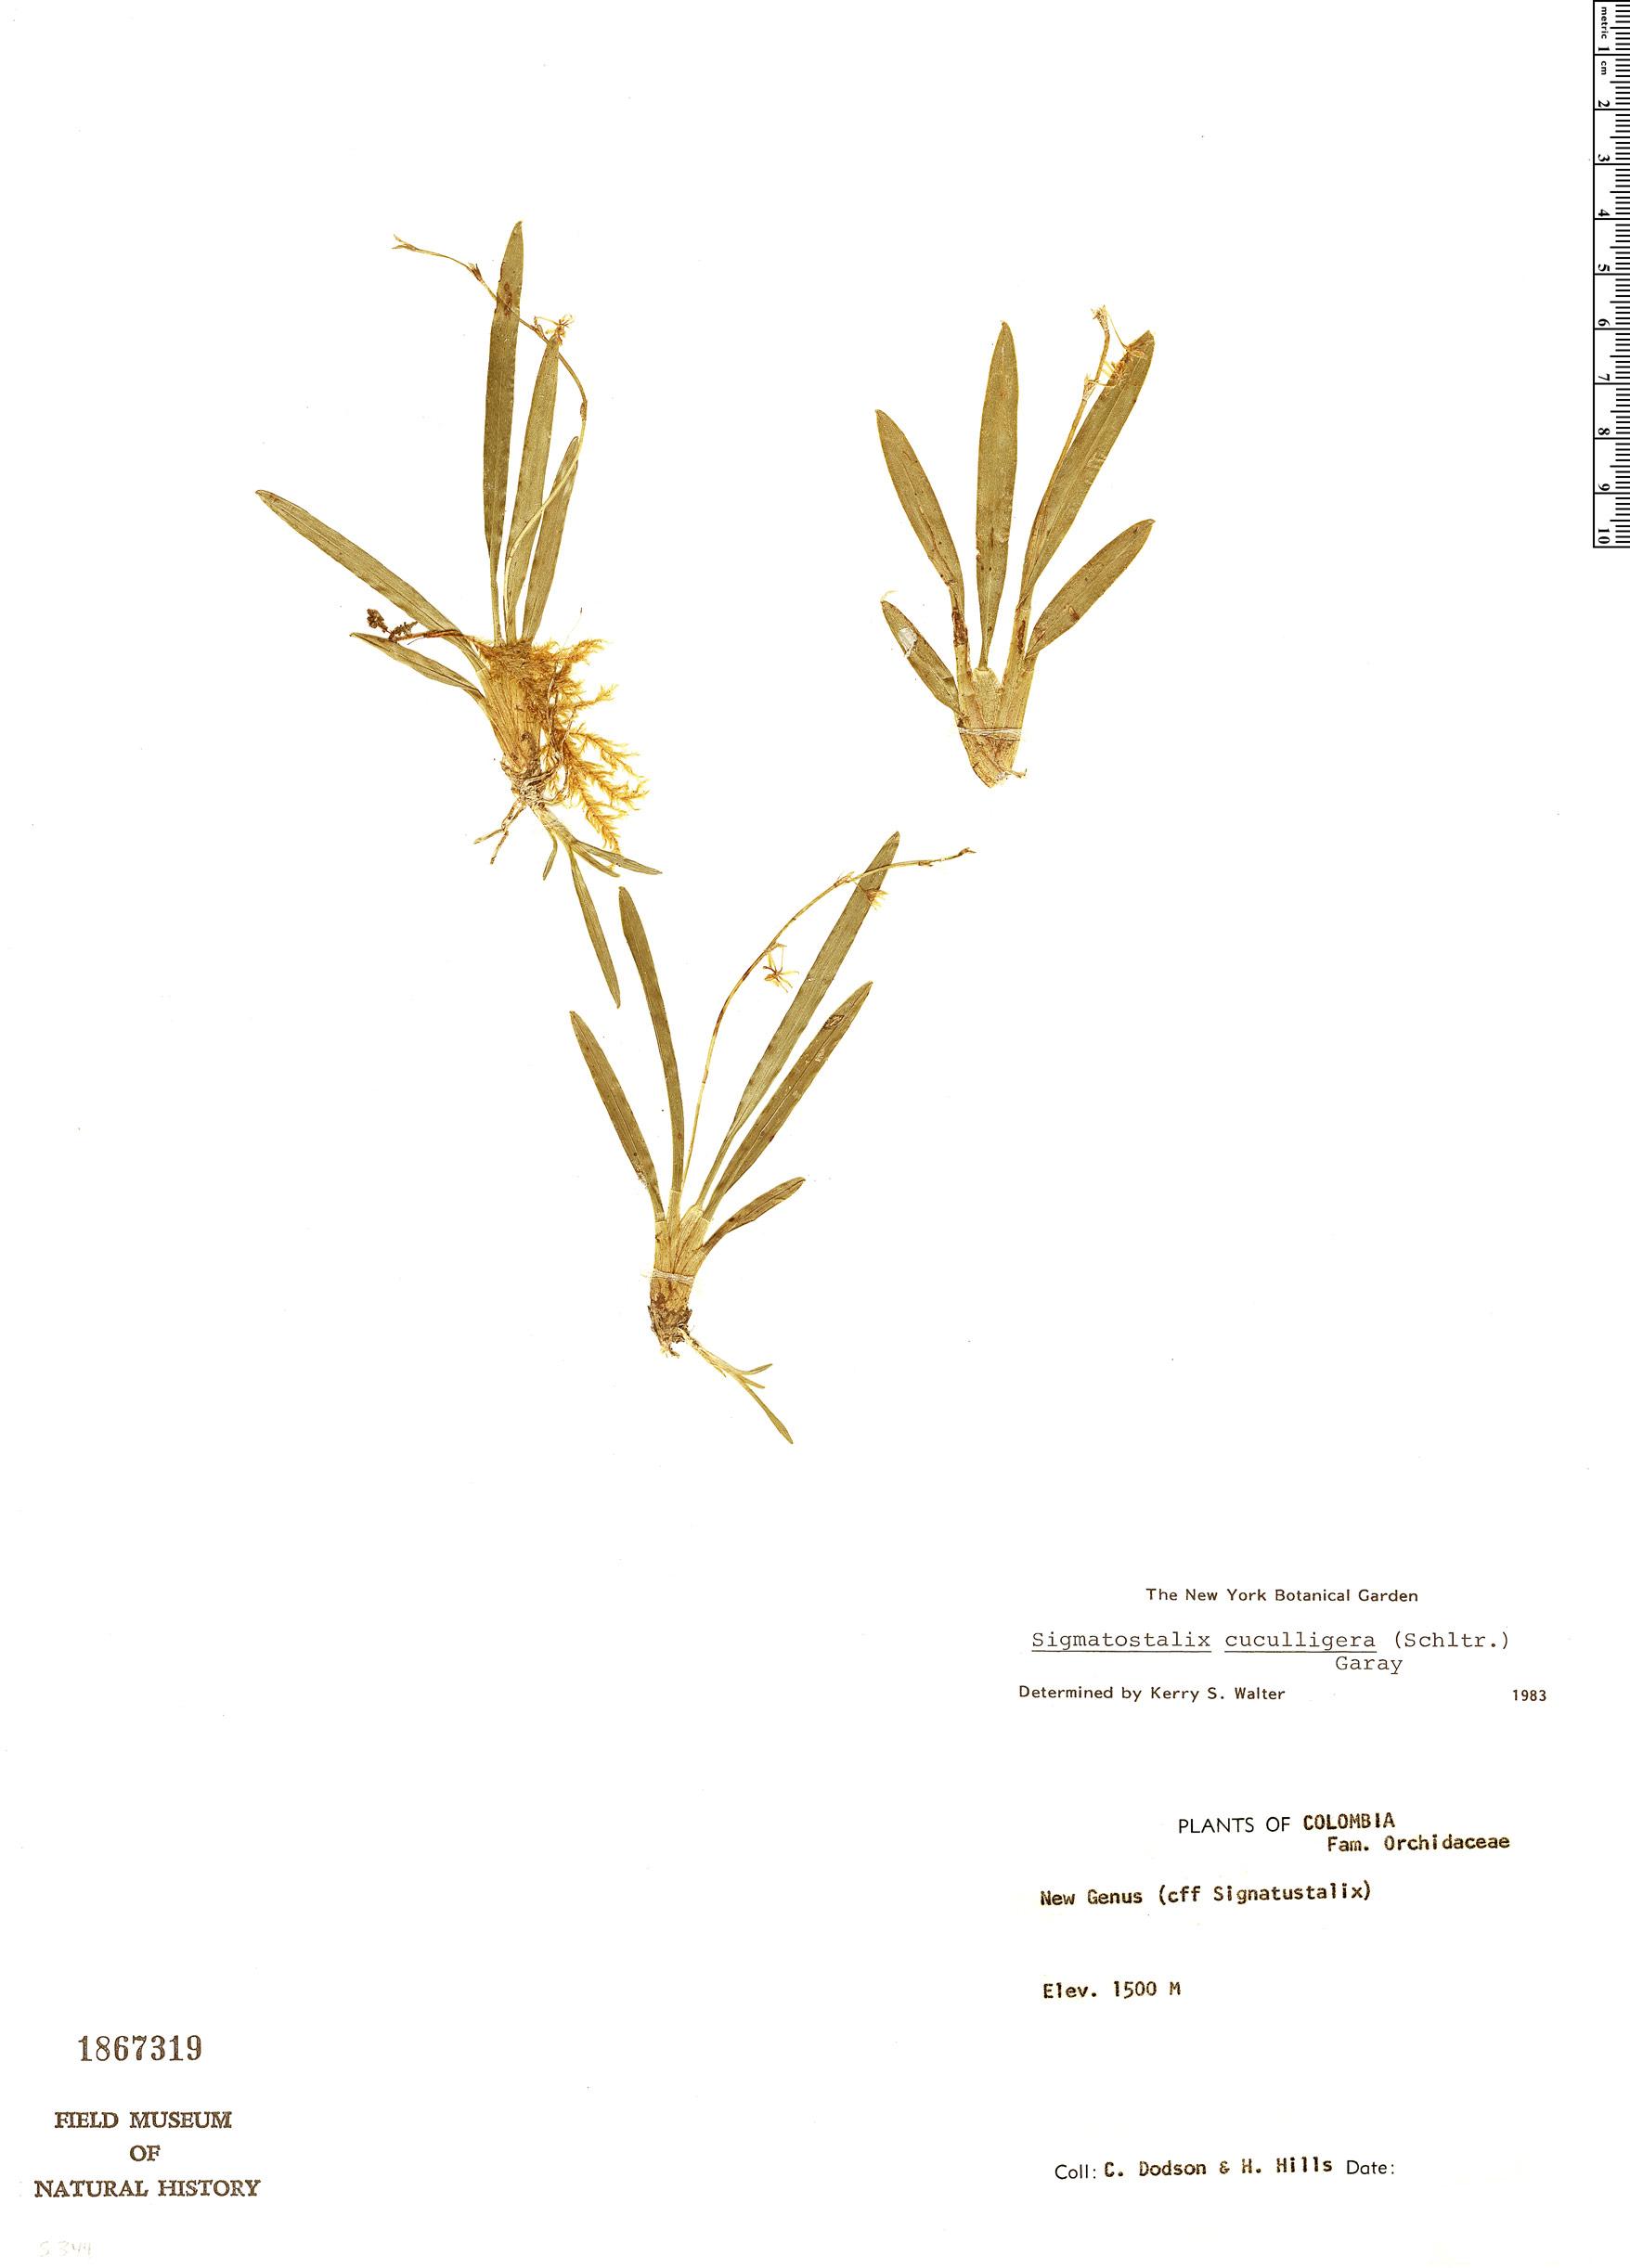 Specimen: Sigmatostalix cuculligera